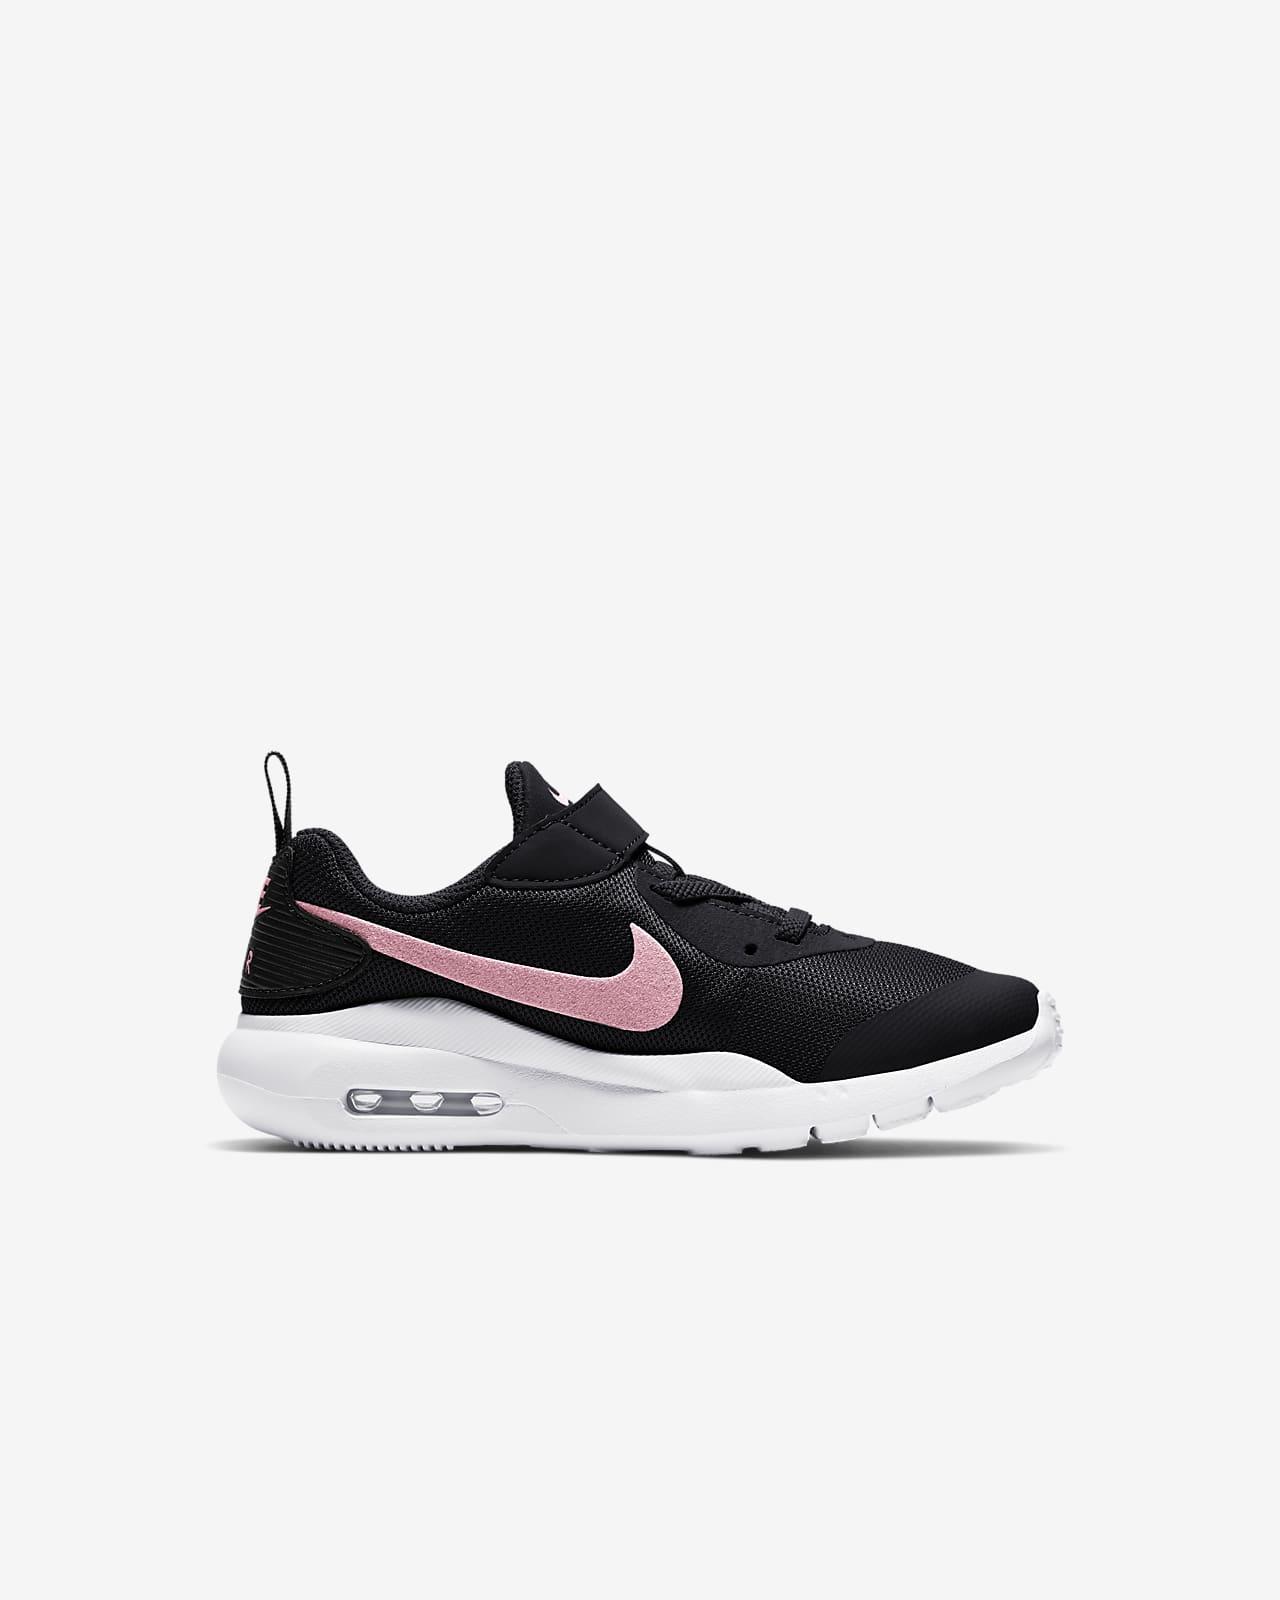 Nike Air Max Oketo Younger Kids' Shoe. Nike FI